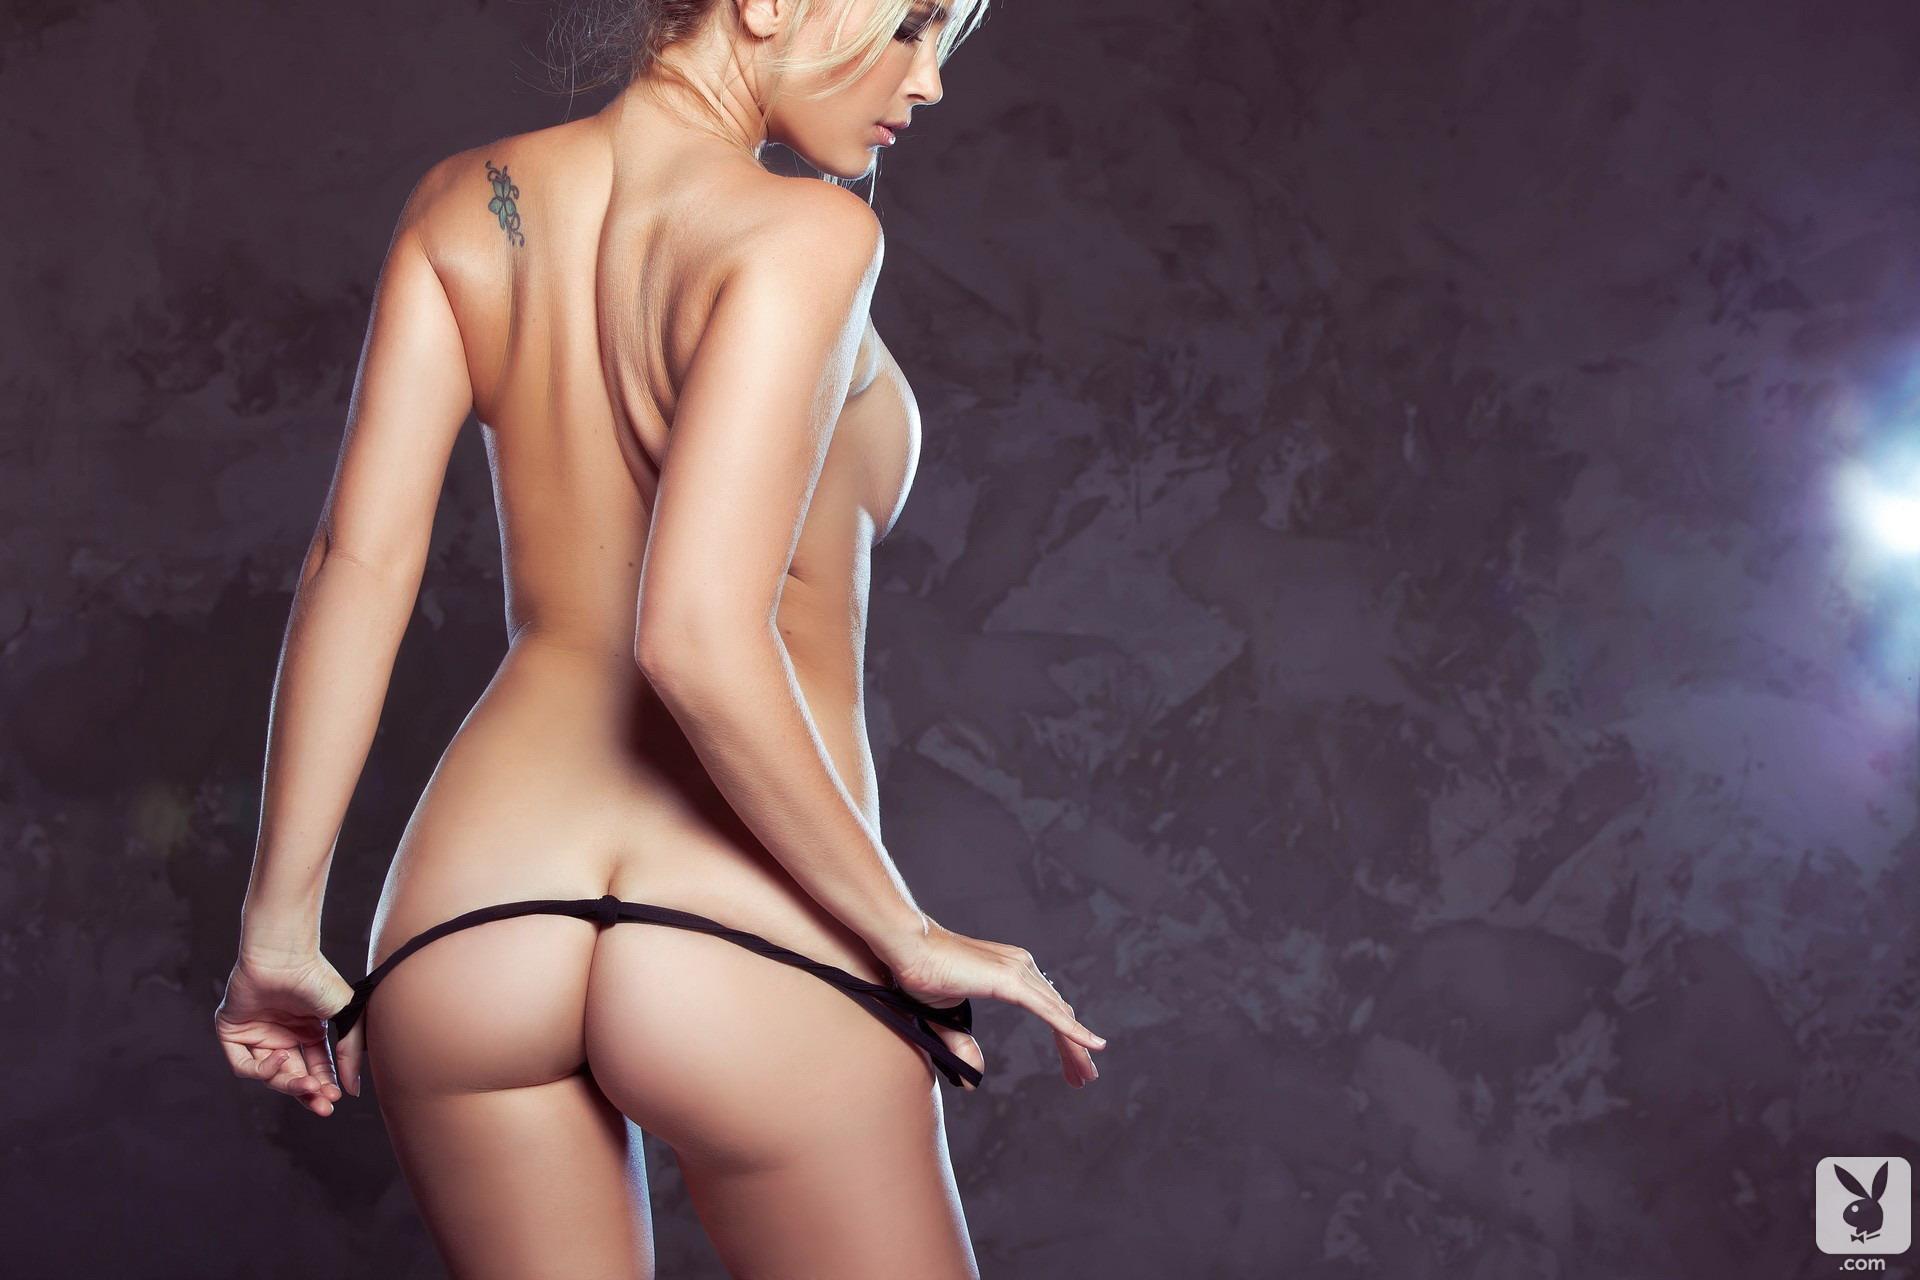 jenni-lynn-glasses-nude-playboy-10